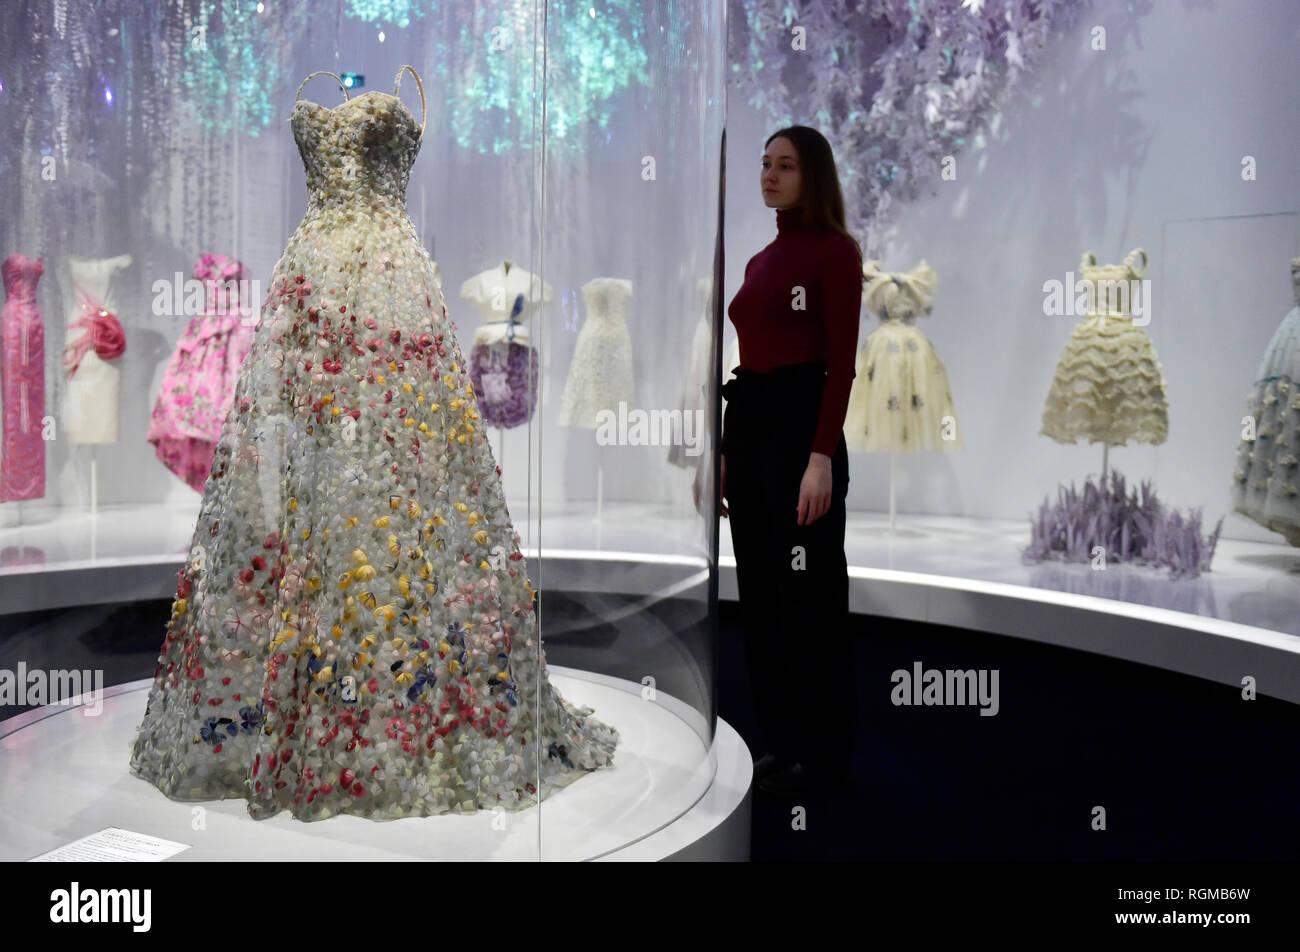 V&A, London, UK  30 January, 2019  Christian Dior, the